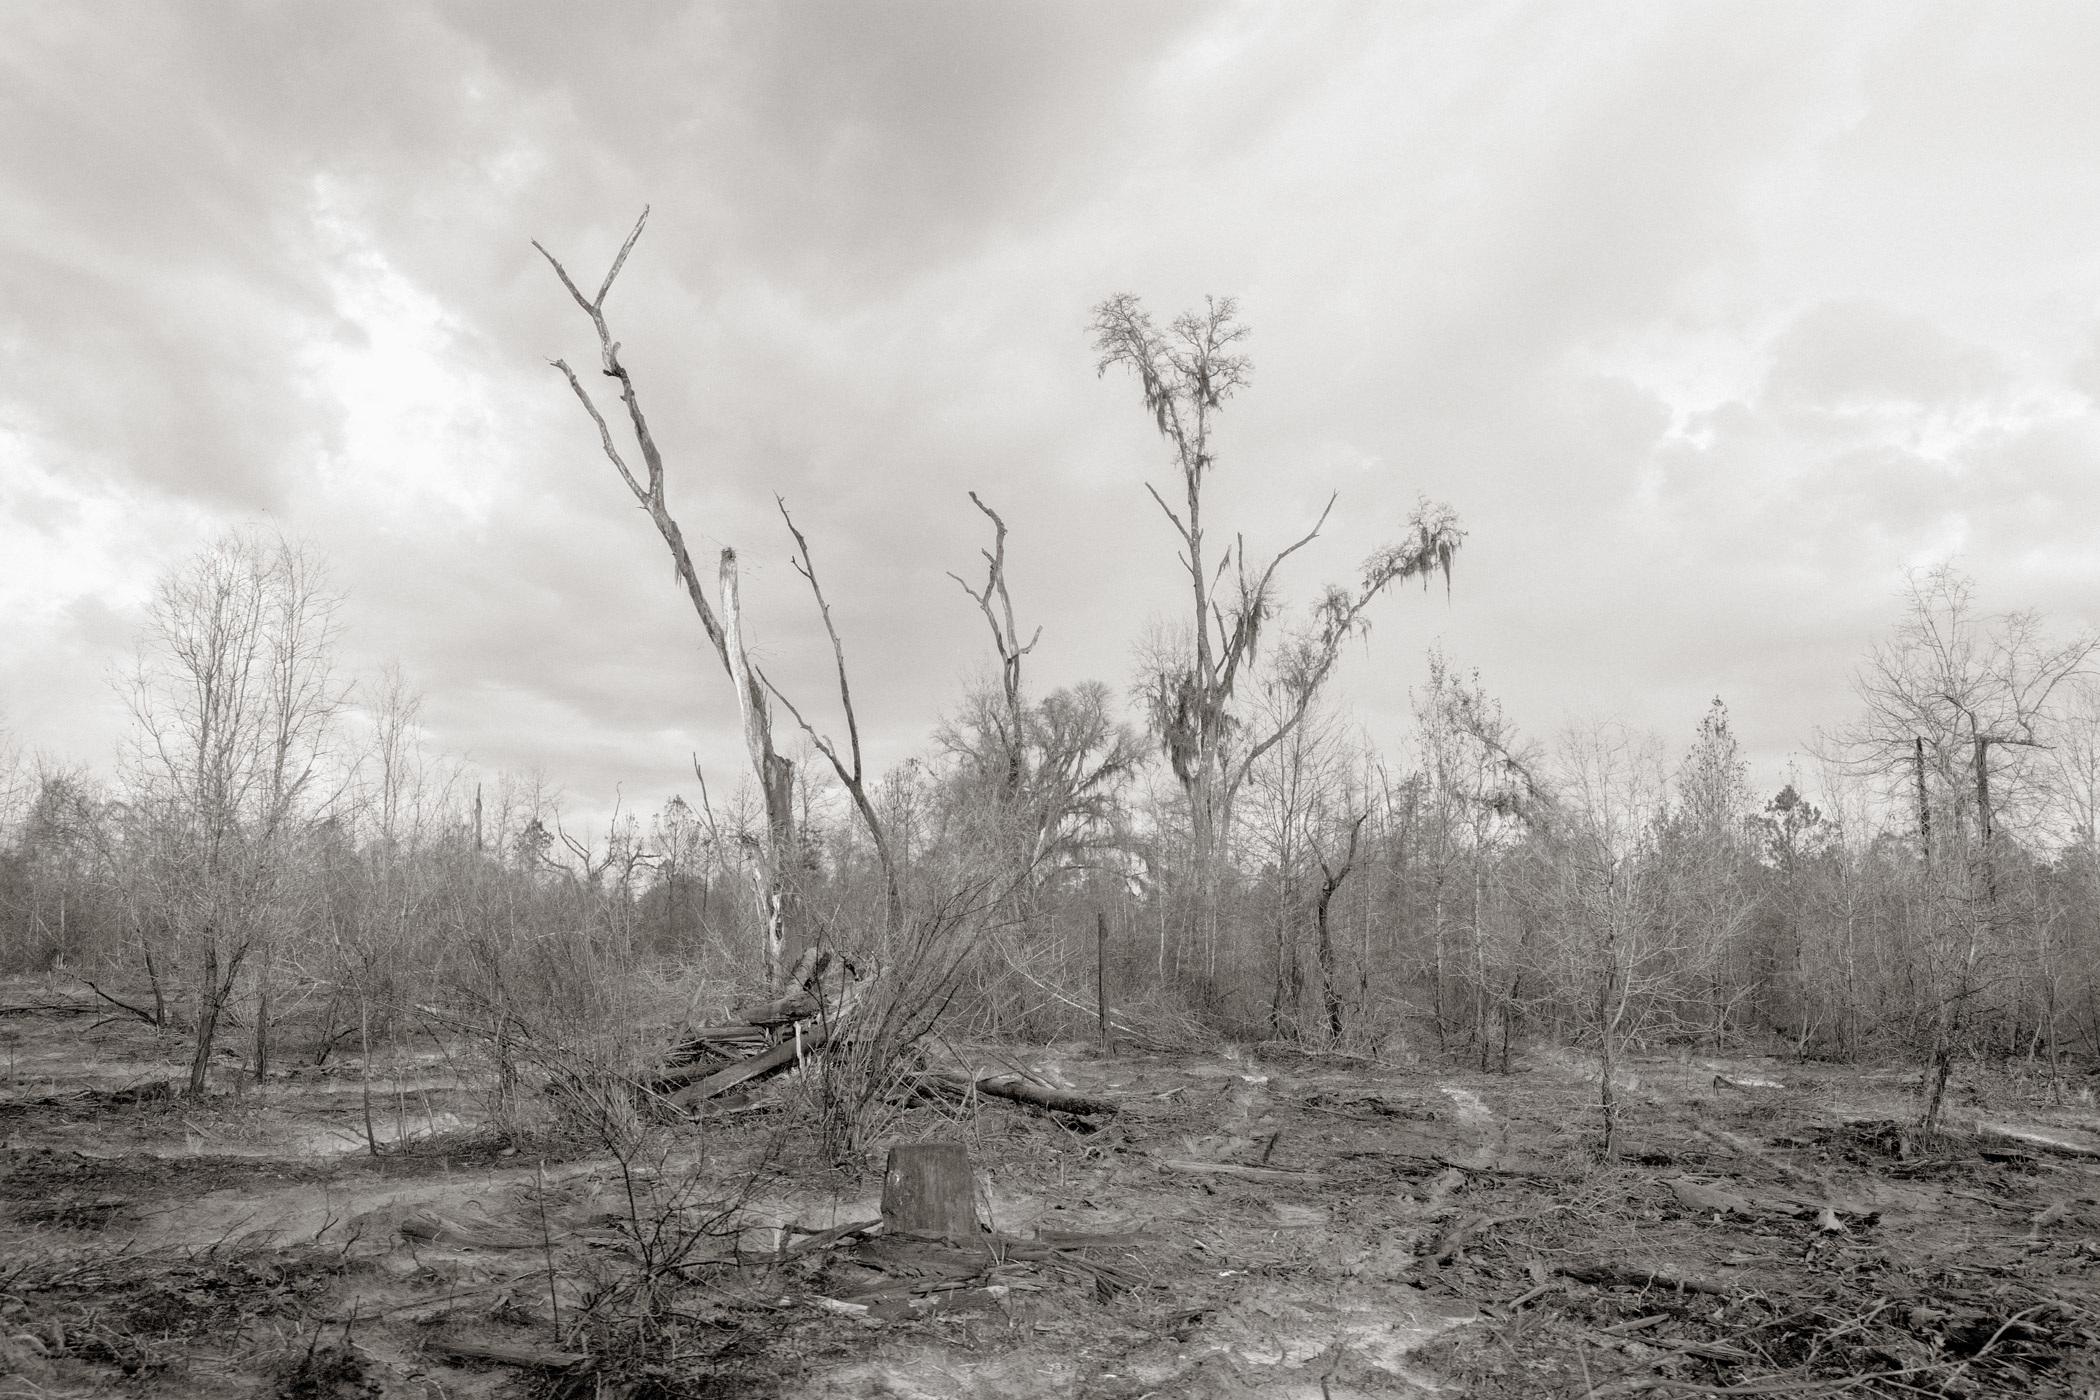 Colin Kelly HWY, Madison County, FL (1)